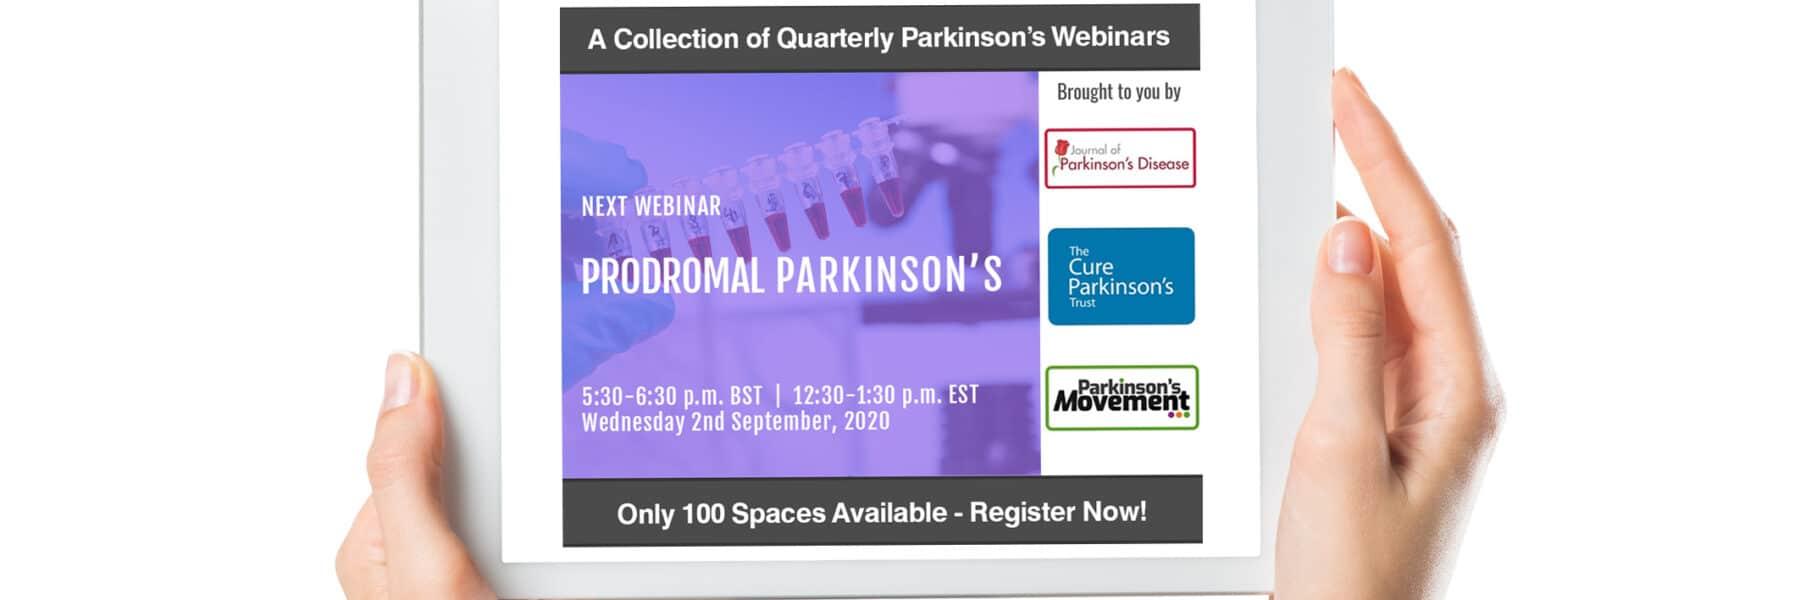 Prodromal Parkinson's